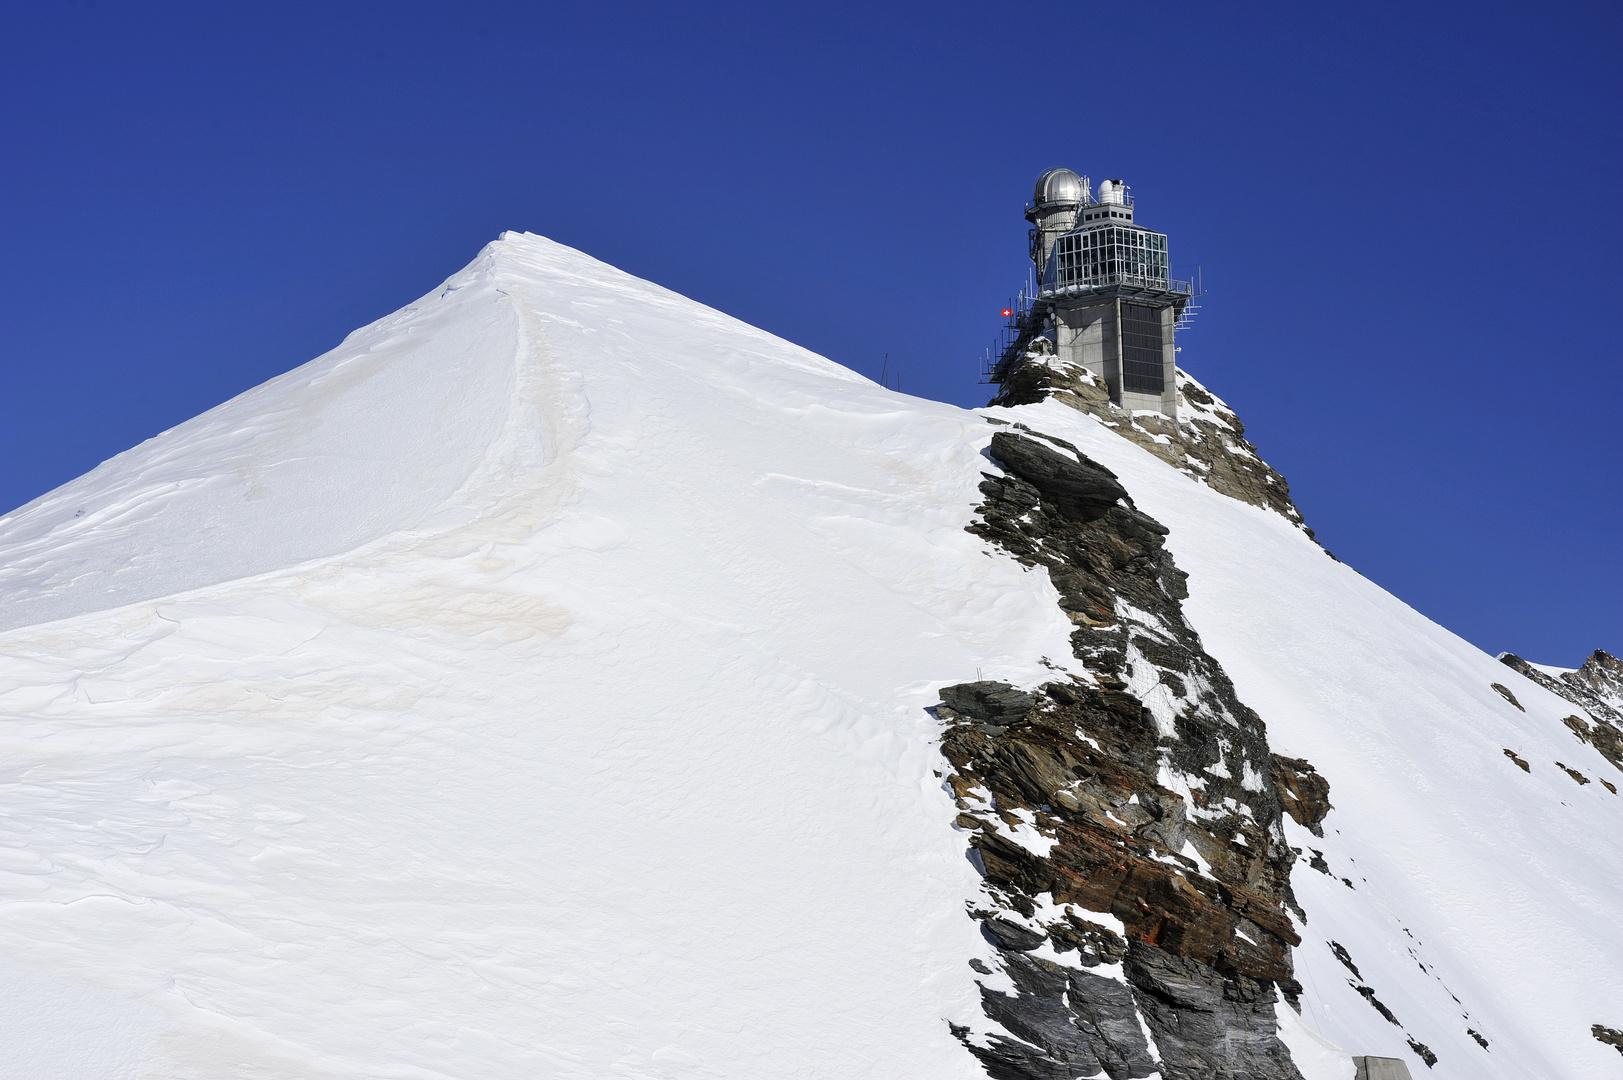 Observatorium in luftiger Höhe